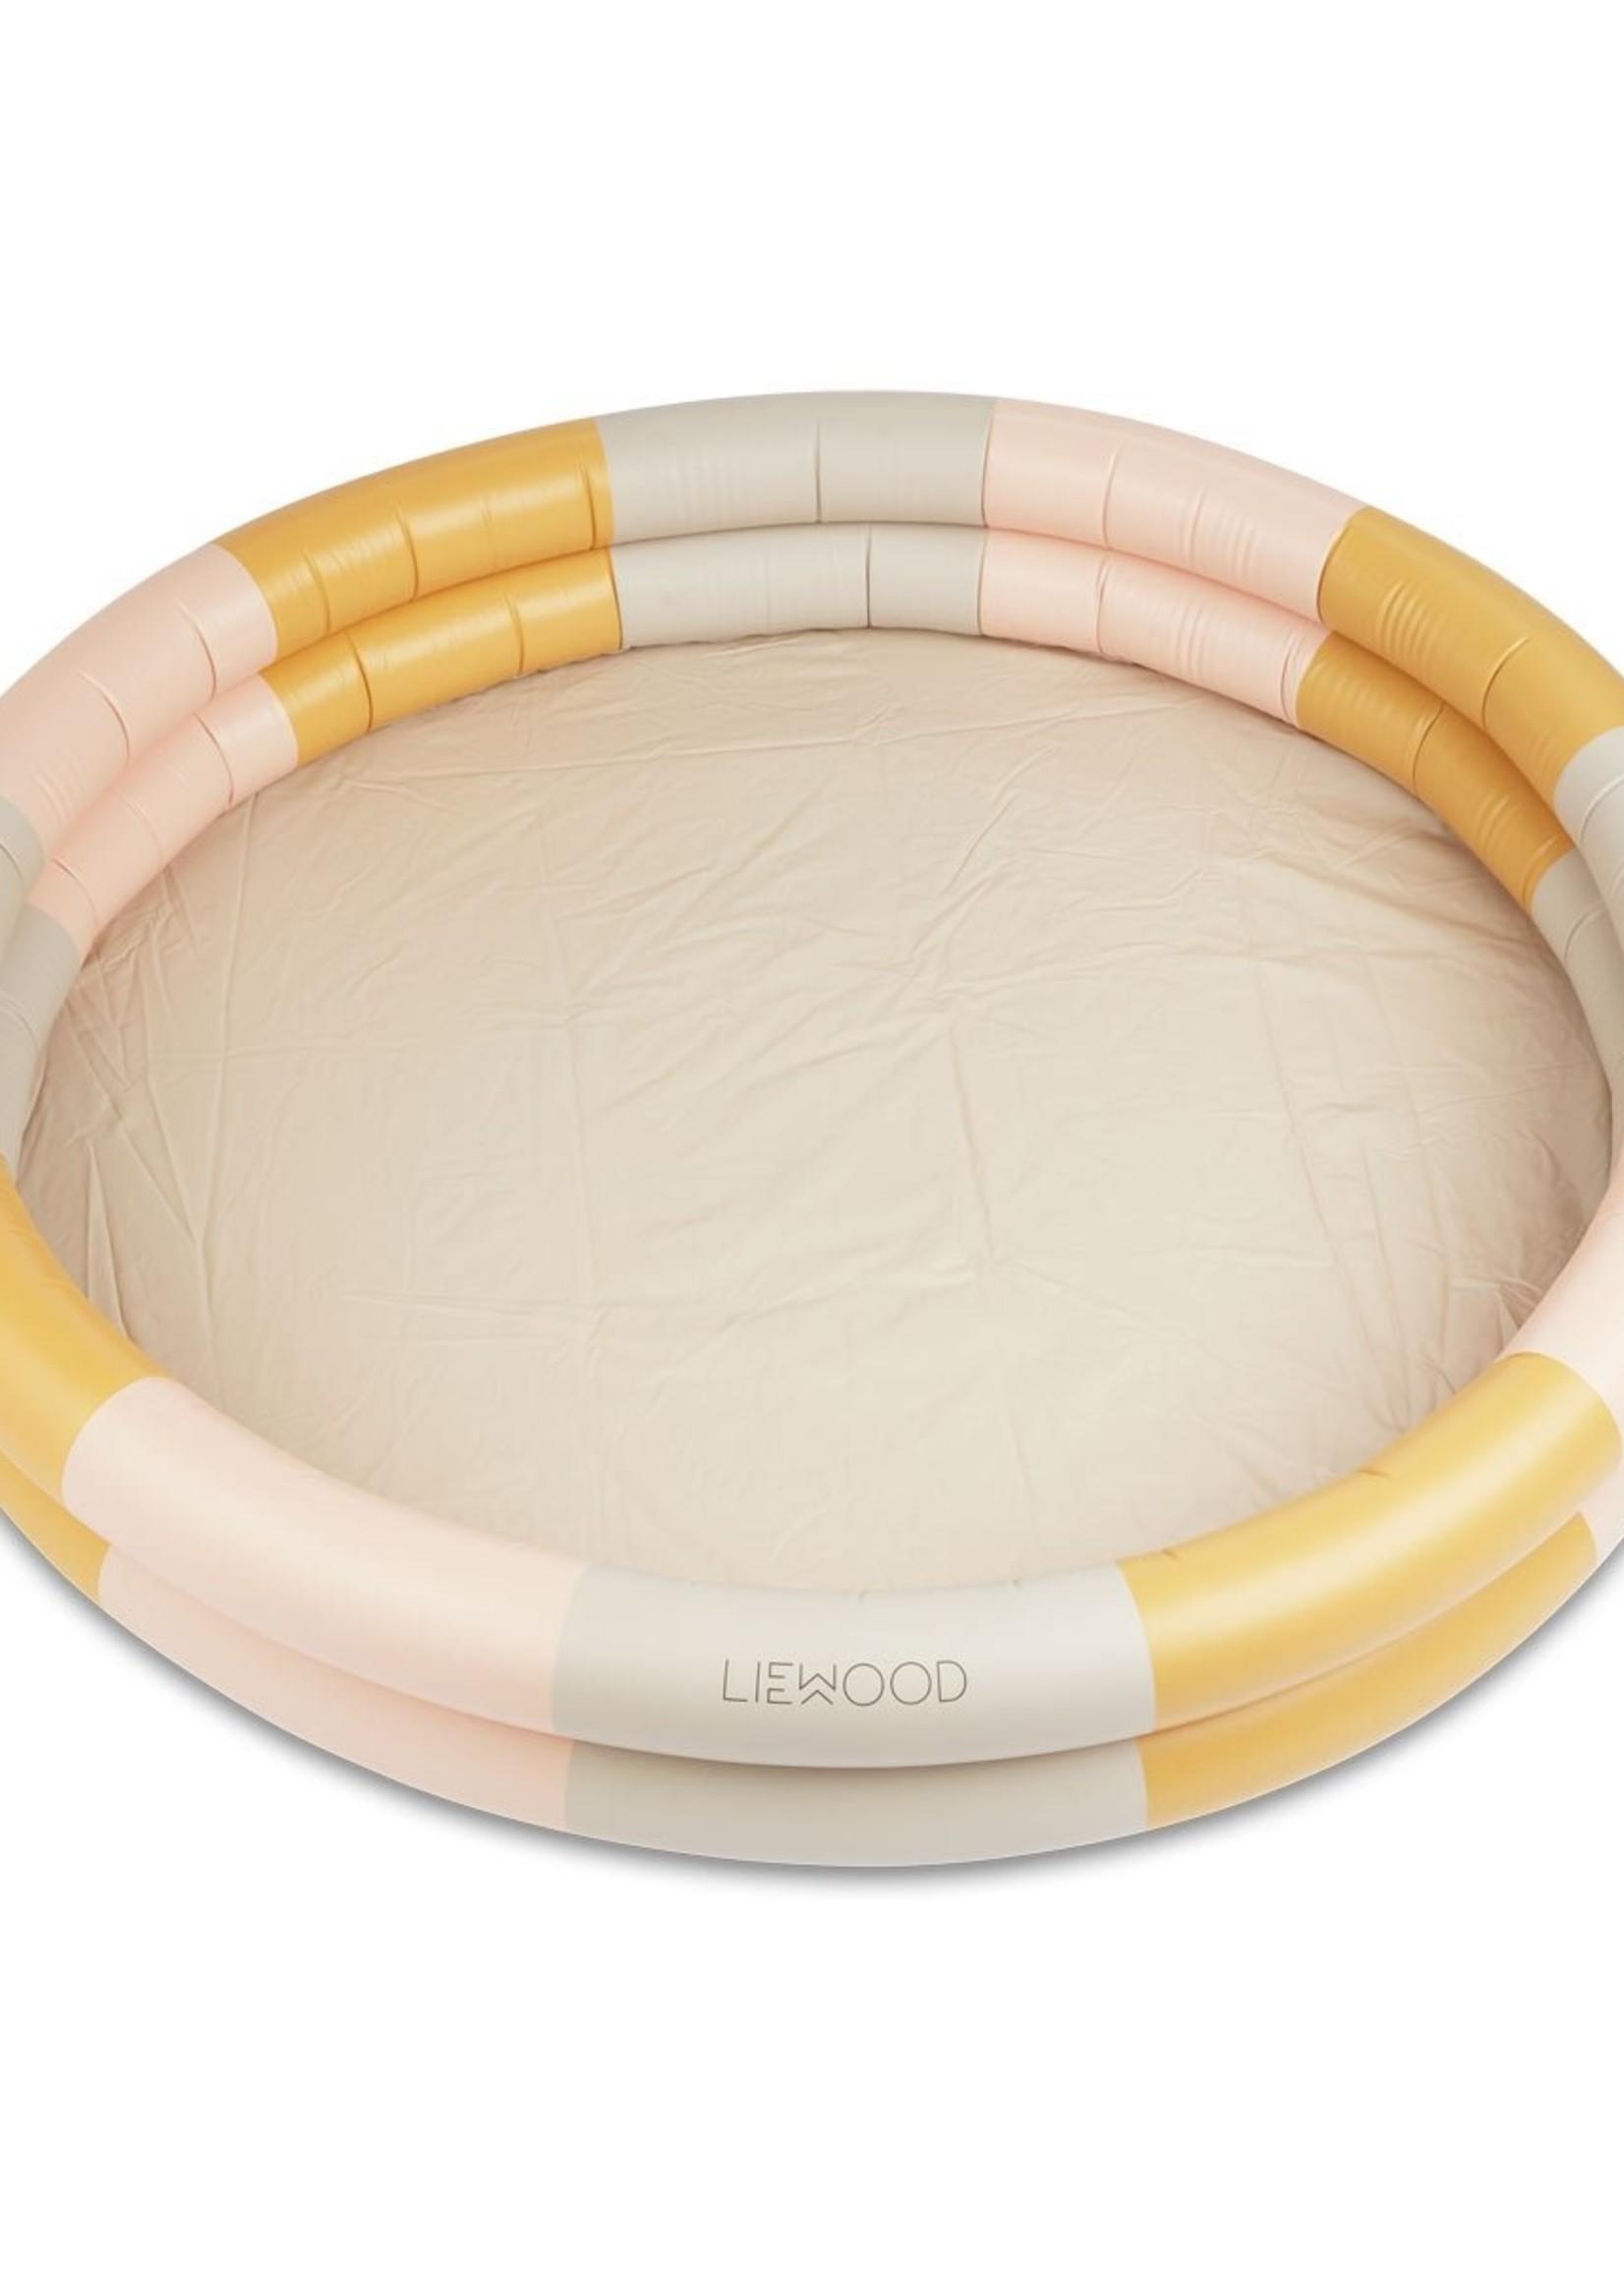 liewood Liewood-AW21 LW14165 Savannah pool